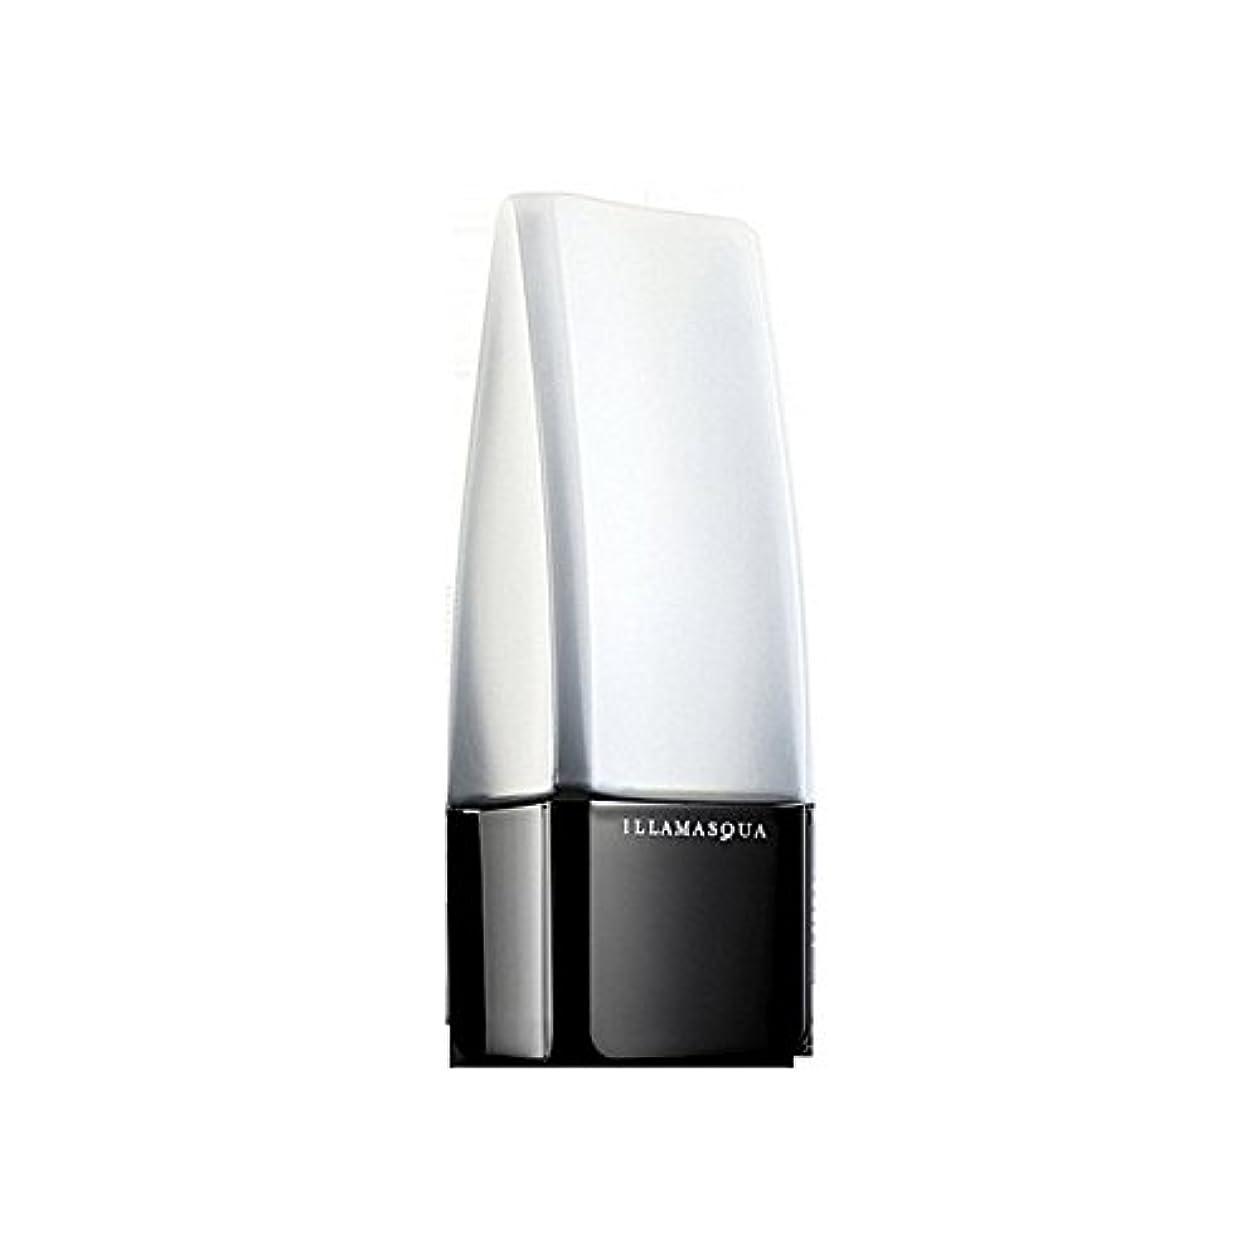 Illamasqua Matt Primer Spf 20 30ml (Pack of 6) - マットプライマー 20 30ミリリットル x6 [並行輸入品]